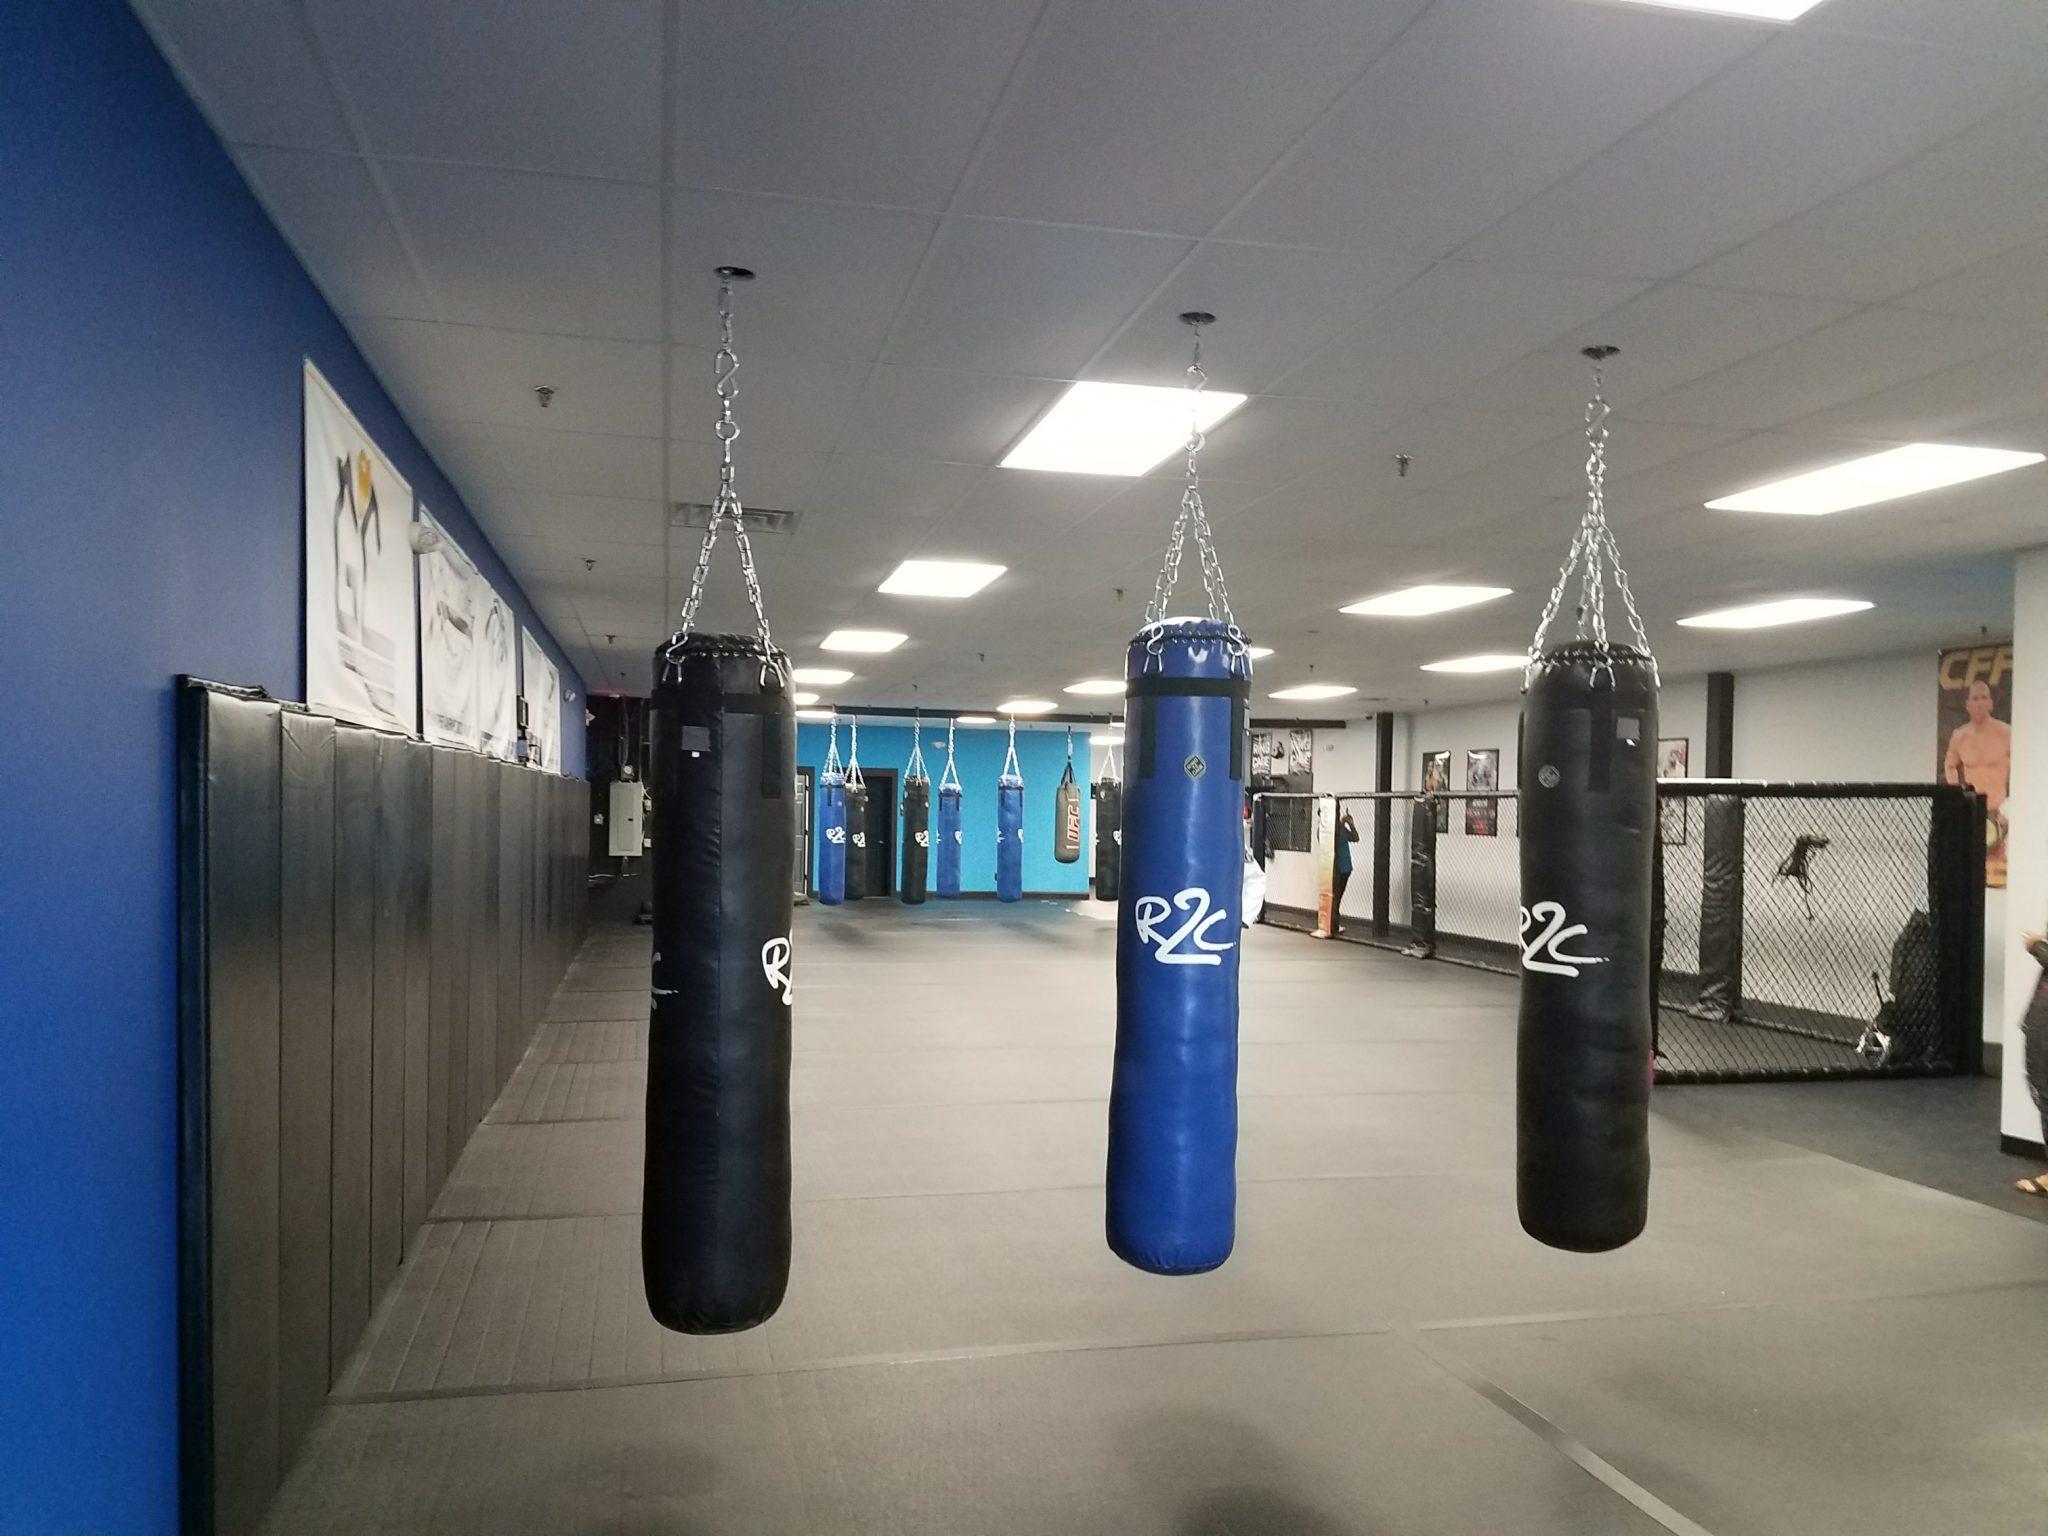 Sullivan Kicboxing Academy, George Sullivan